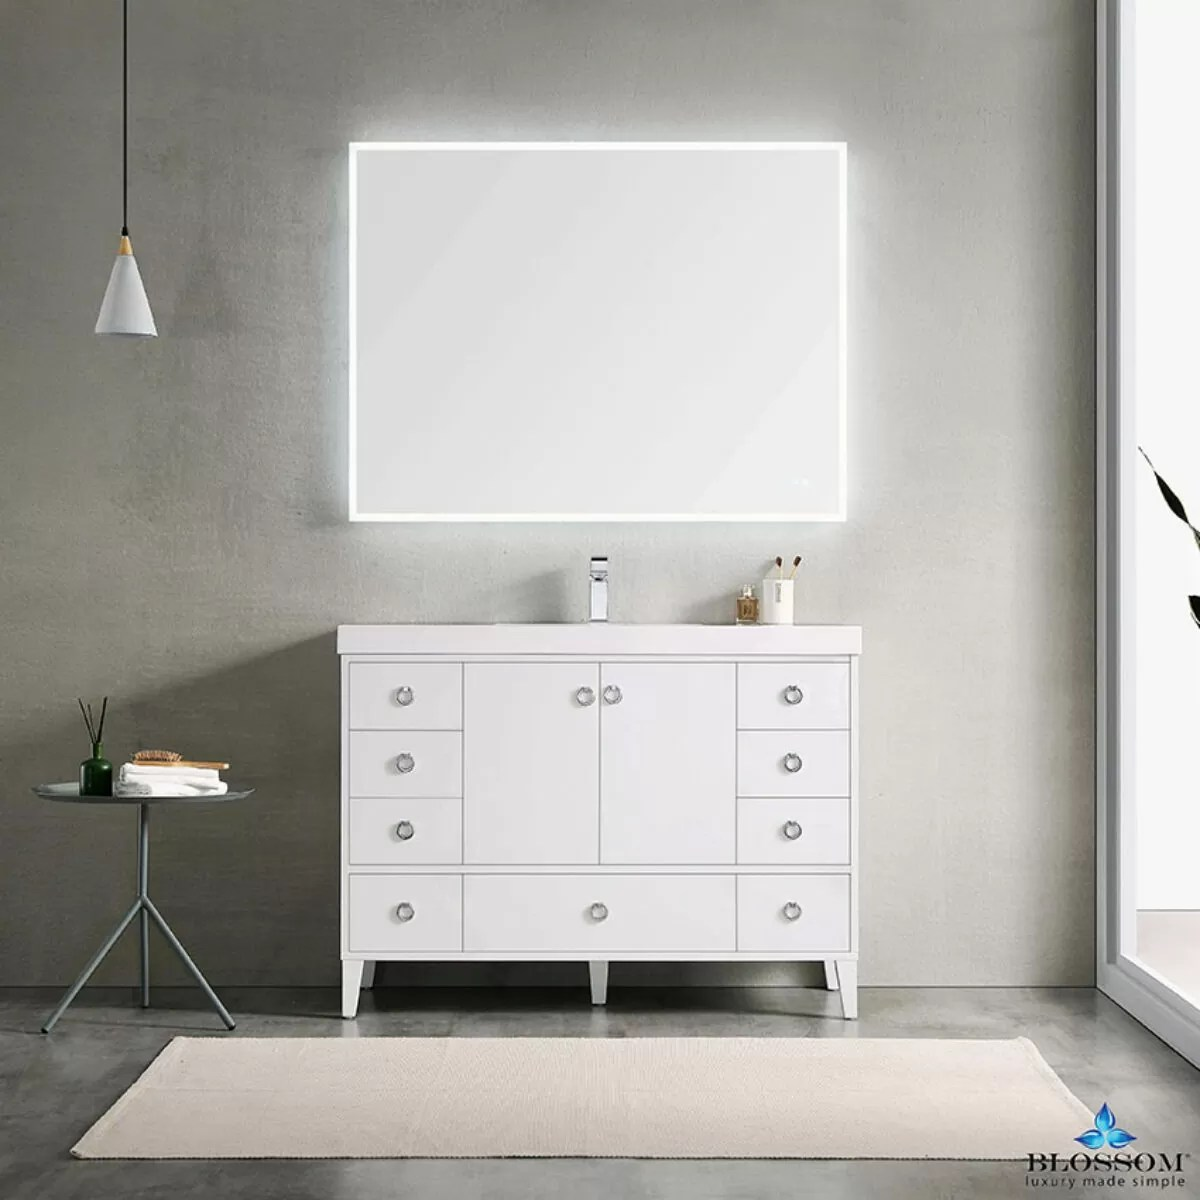 Bolossom Lyon 48 Inch Freestanding Single Buy Bathroom Vanity Online